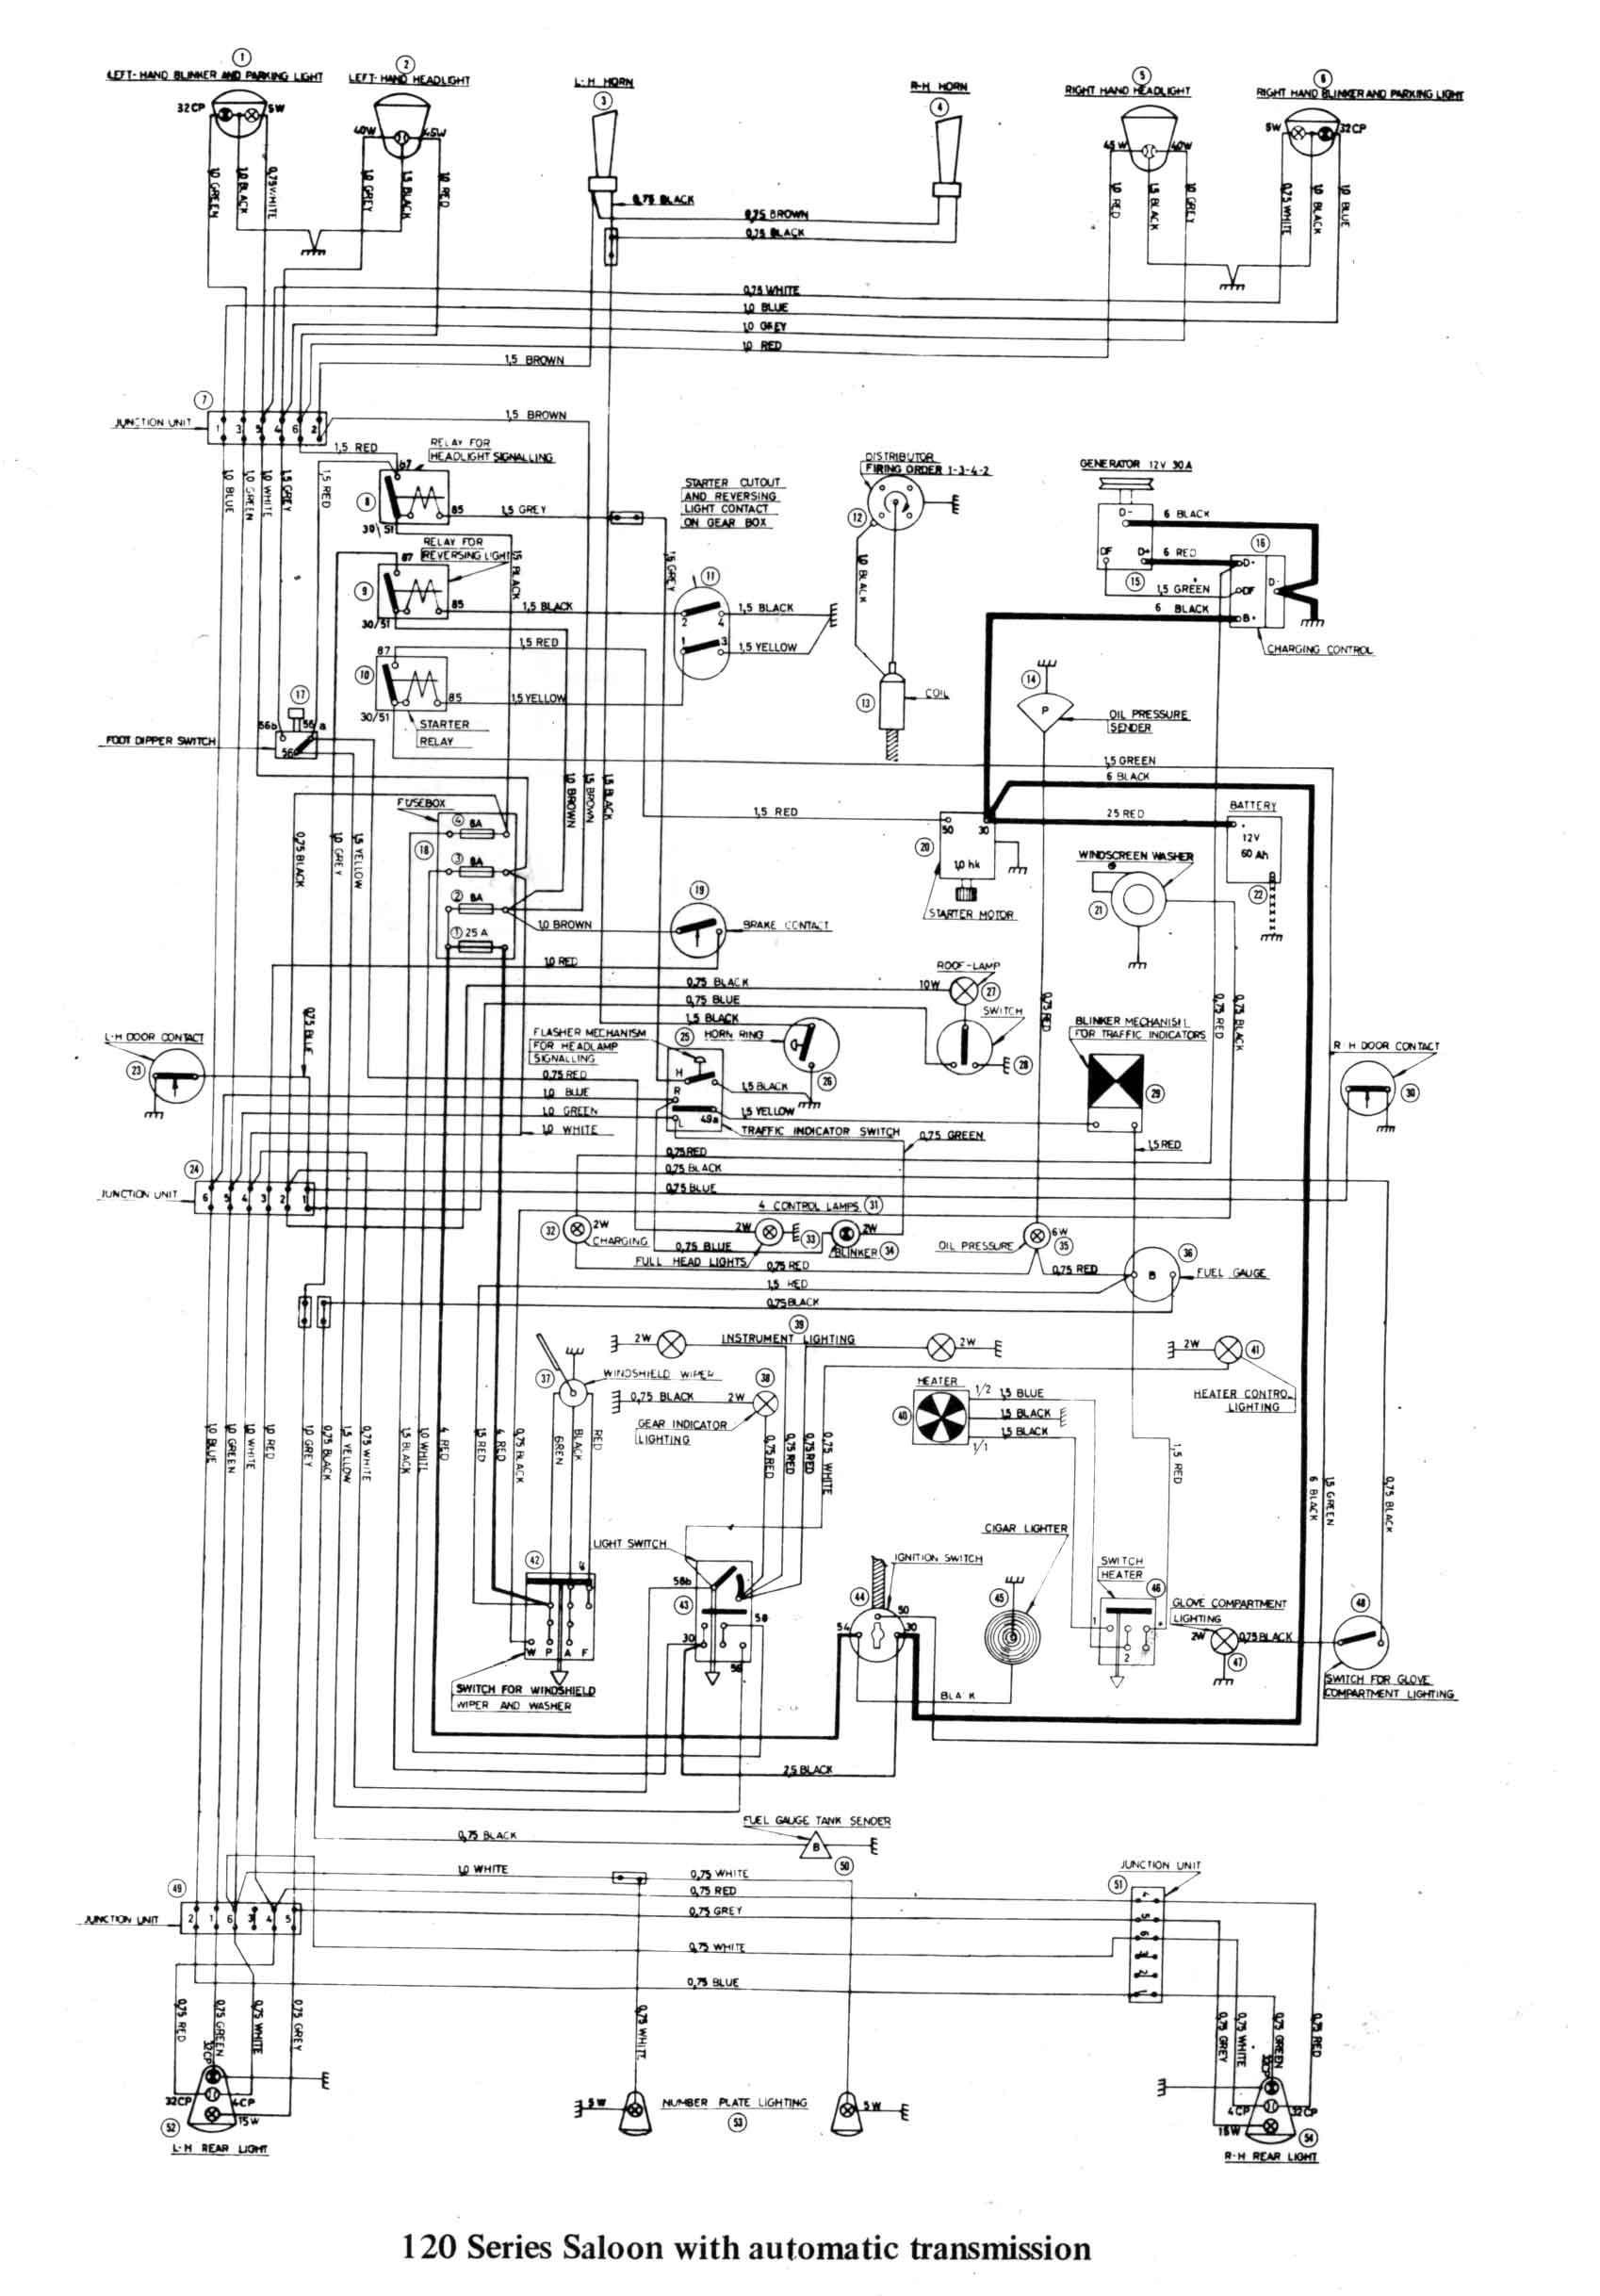 Saab 93 Engine Diagram 2000 Volvo V70 Wiring Diagram Trans Wiring Diagrams  • Of Saab 93. Saab 93 Engine Diagram 2003 Saab 9 3 Convertible ...